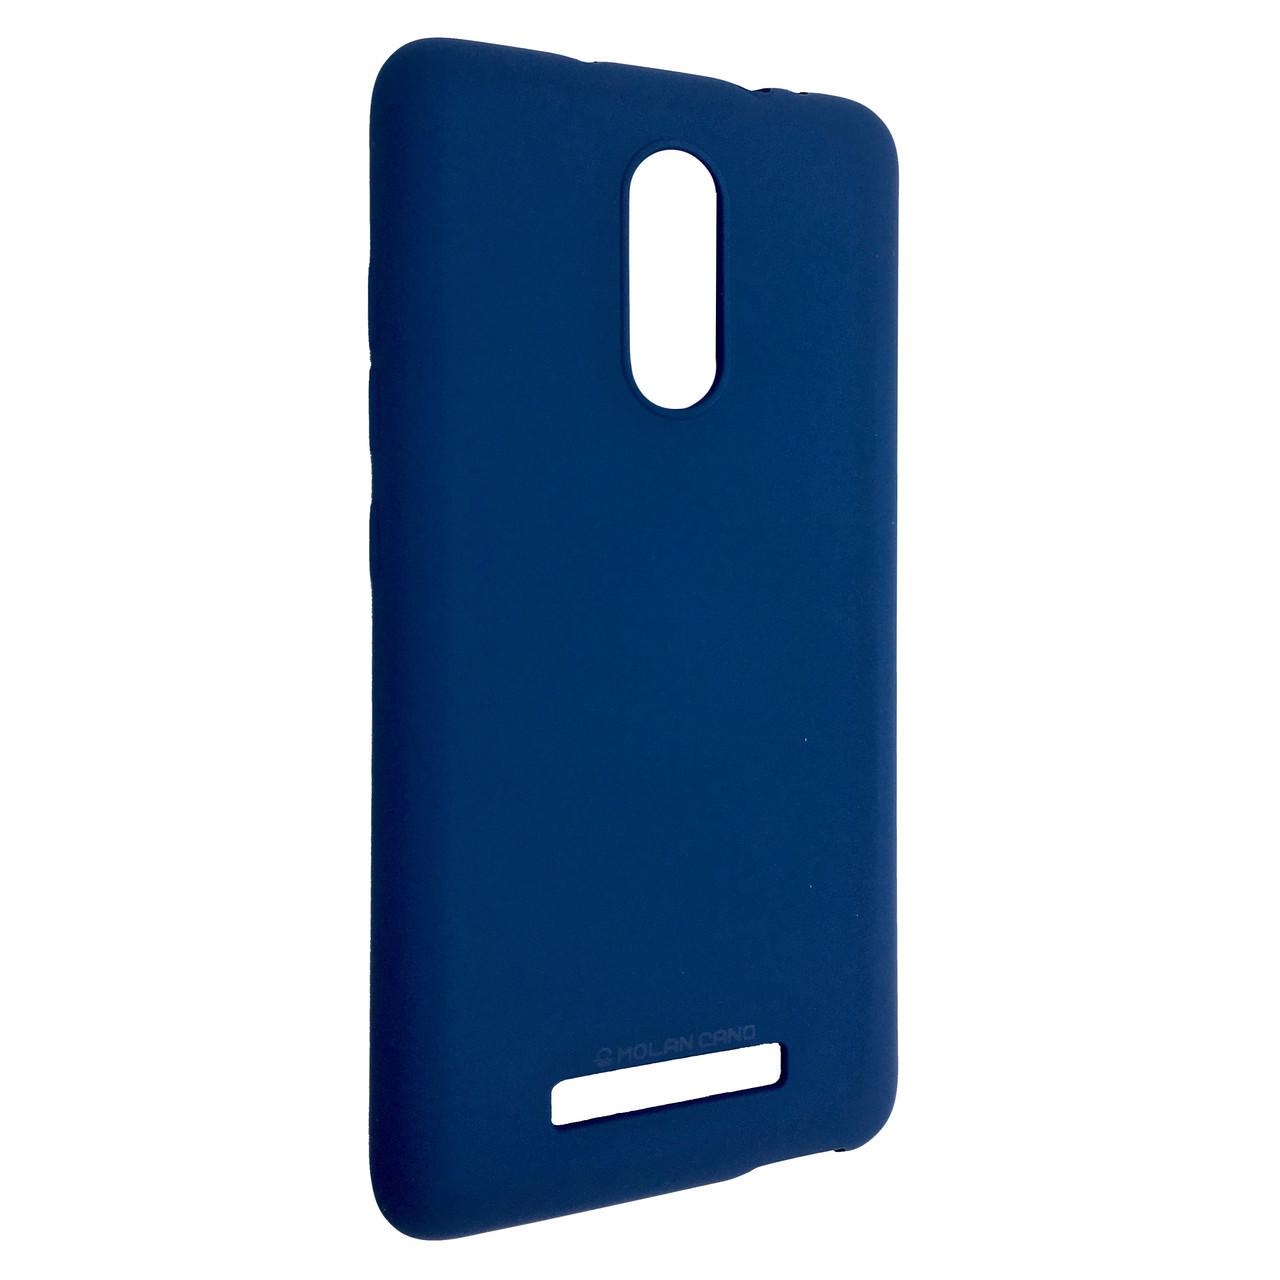 Чехол Hana Molan Cano Xiaomi Redmi Note 3 (blue)